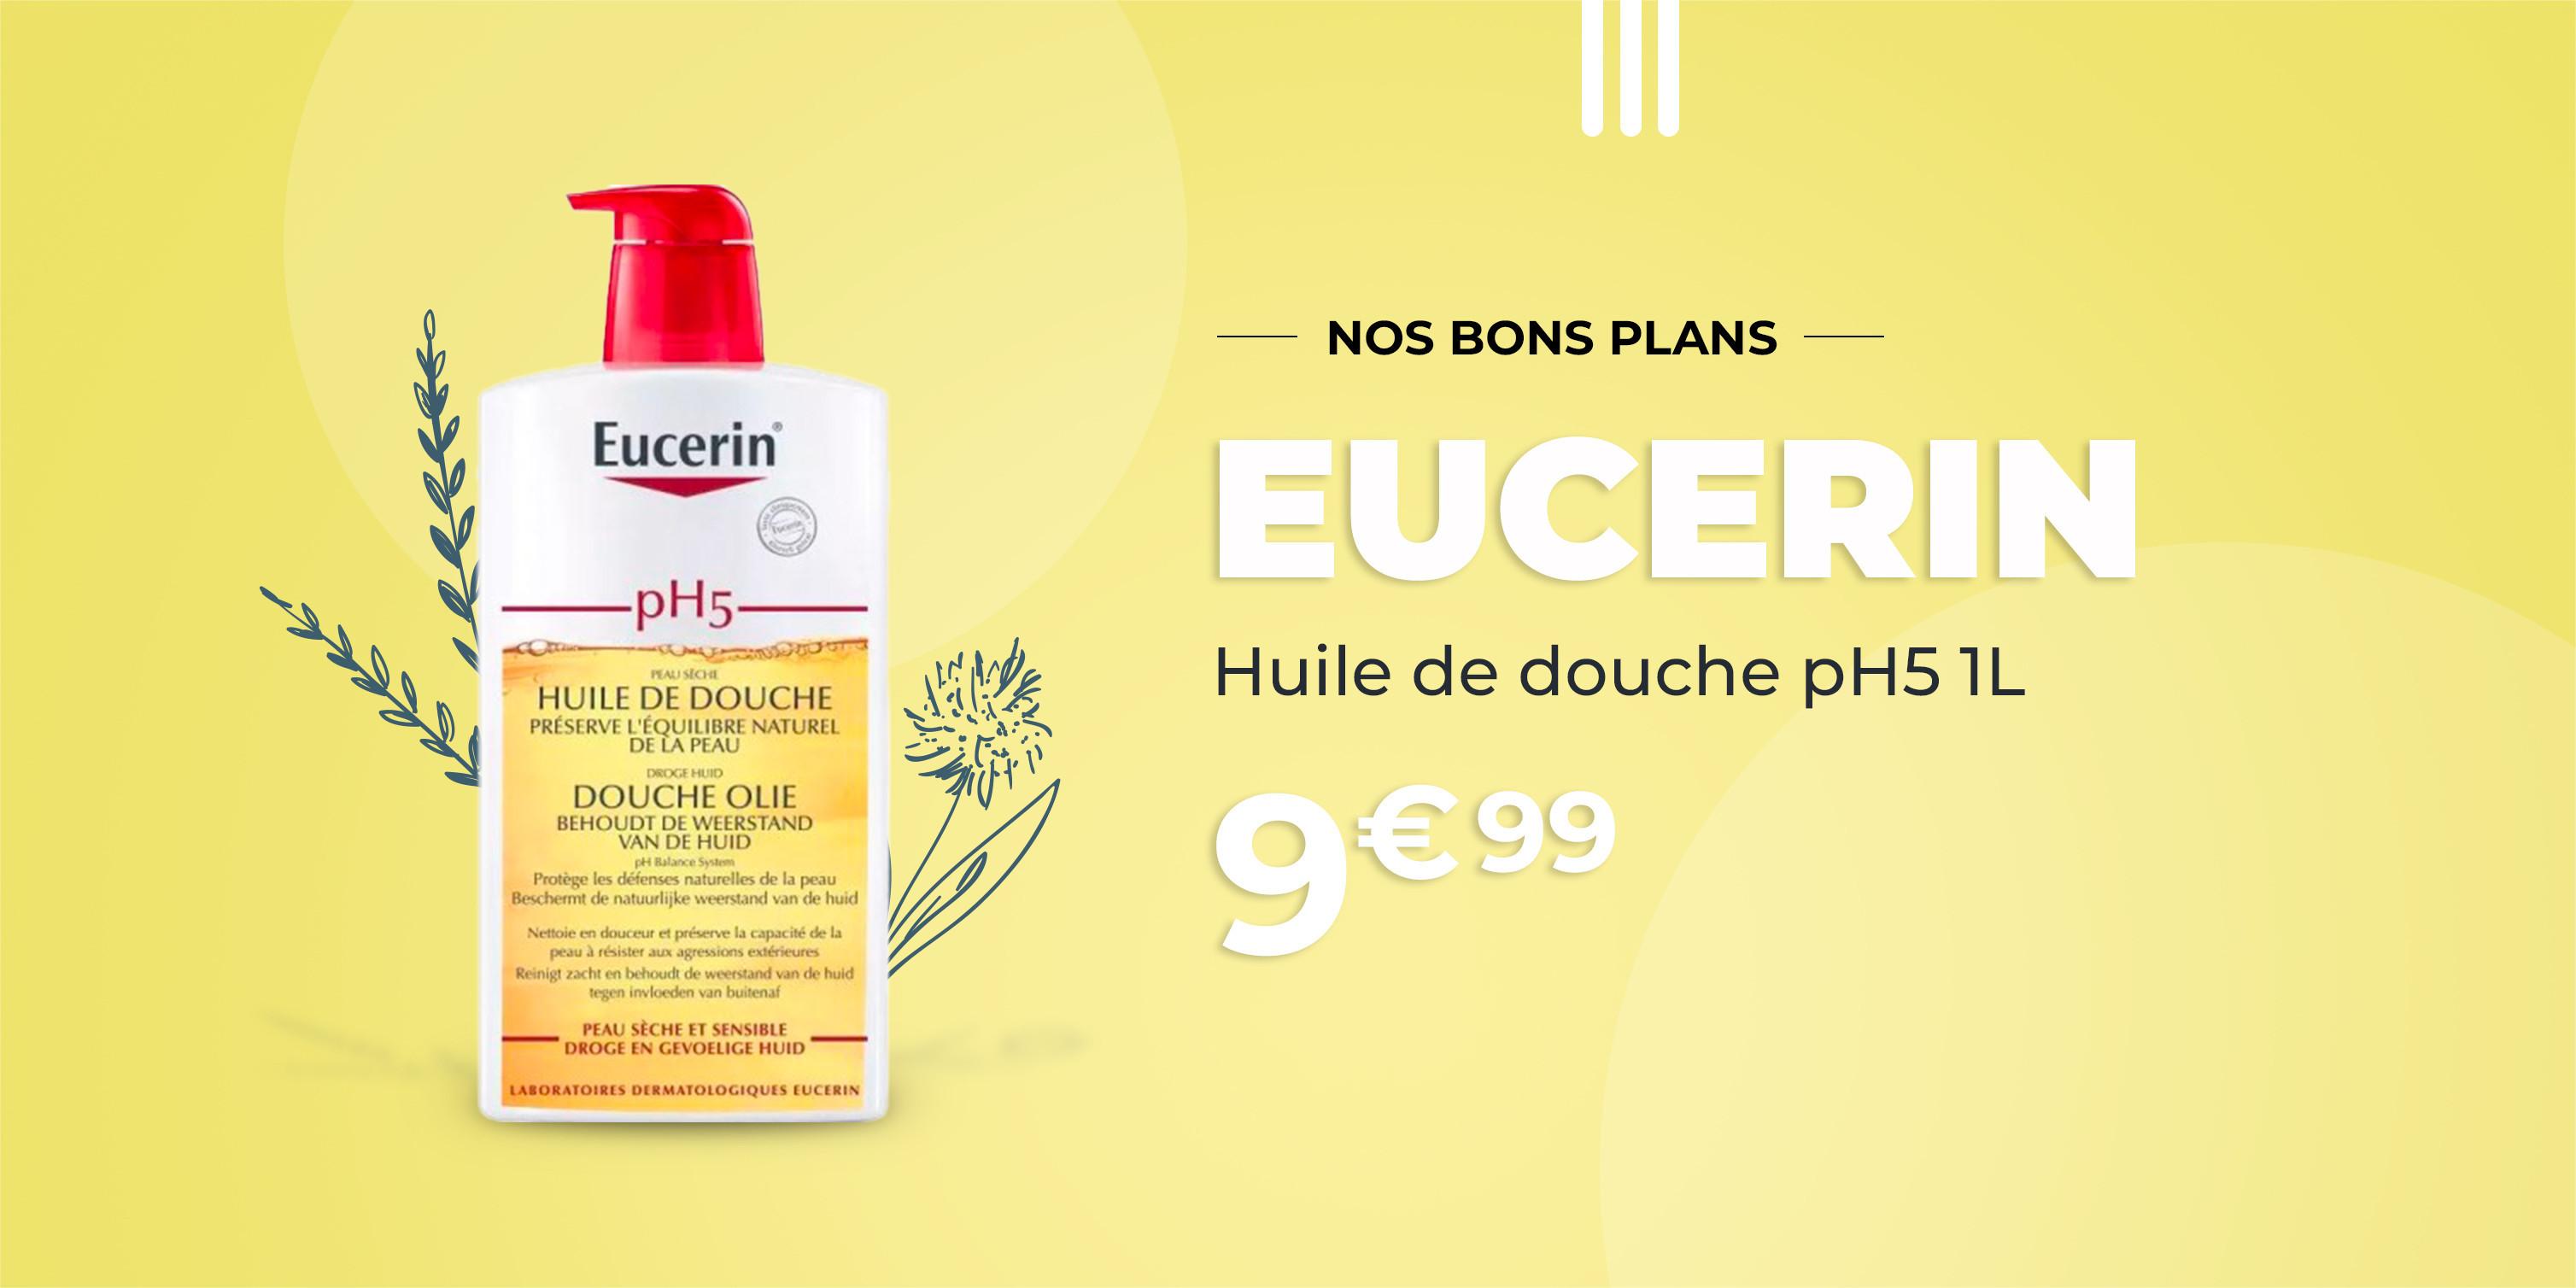 EUCERIN Huile de Douche pH5 - 1L